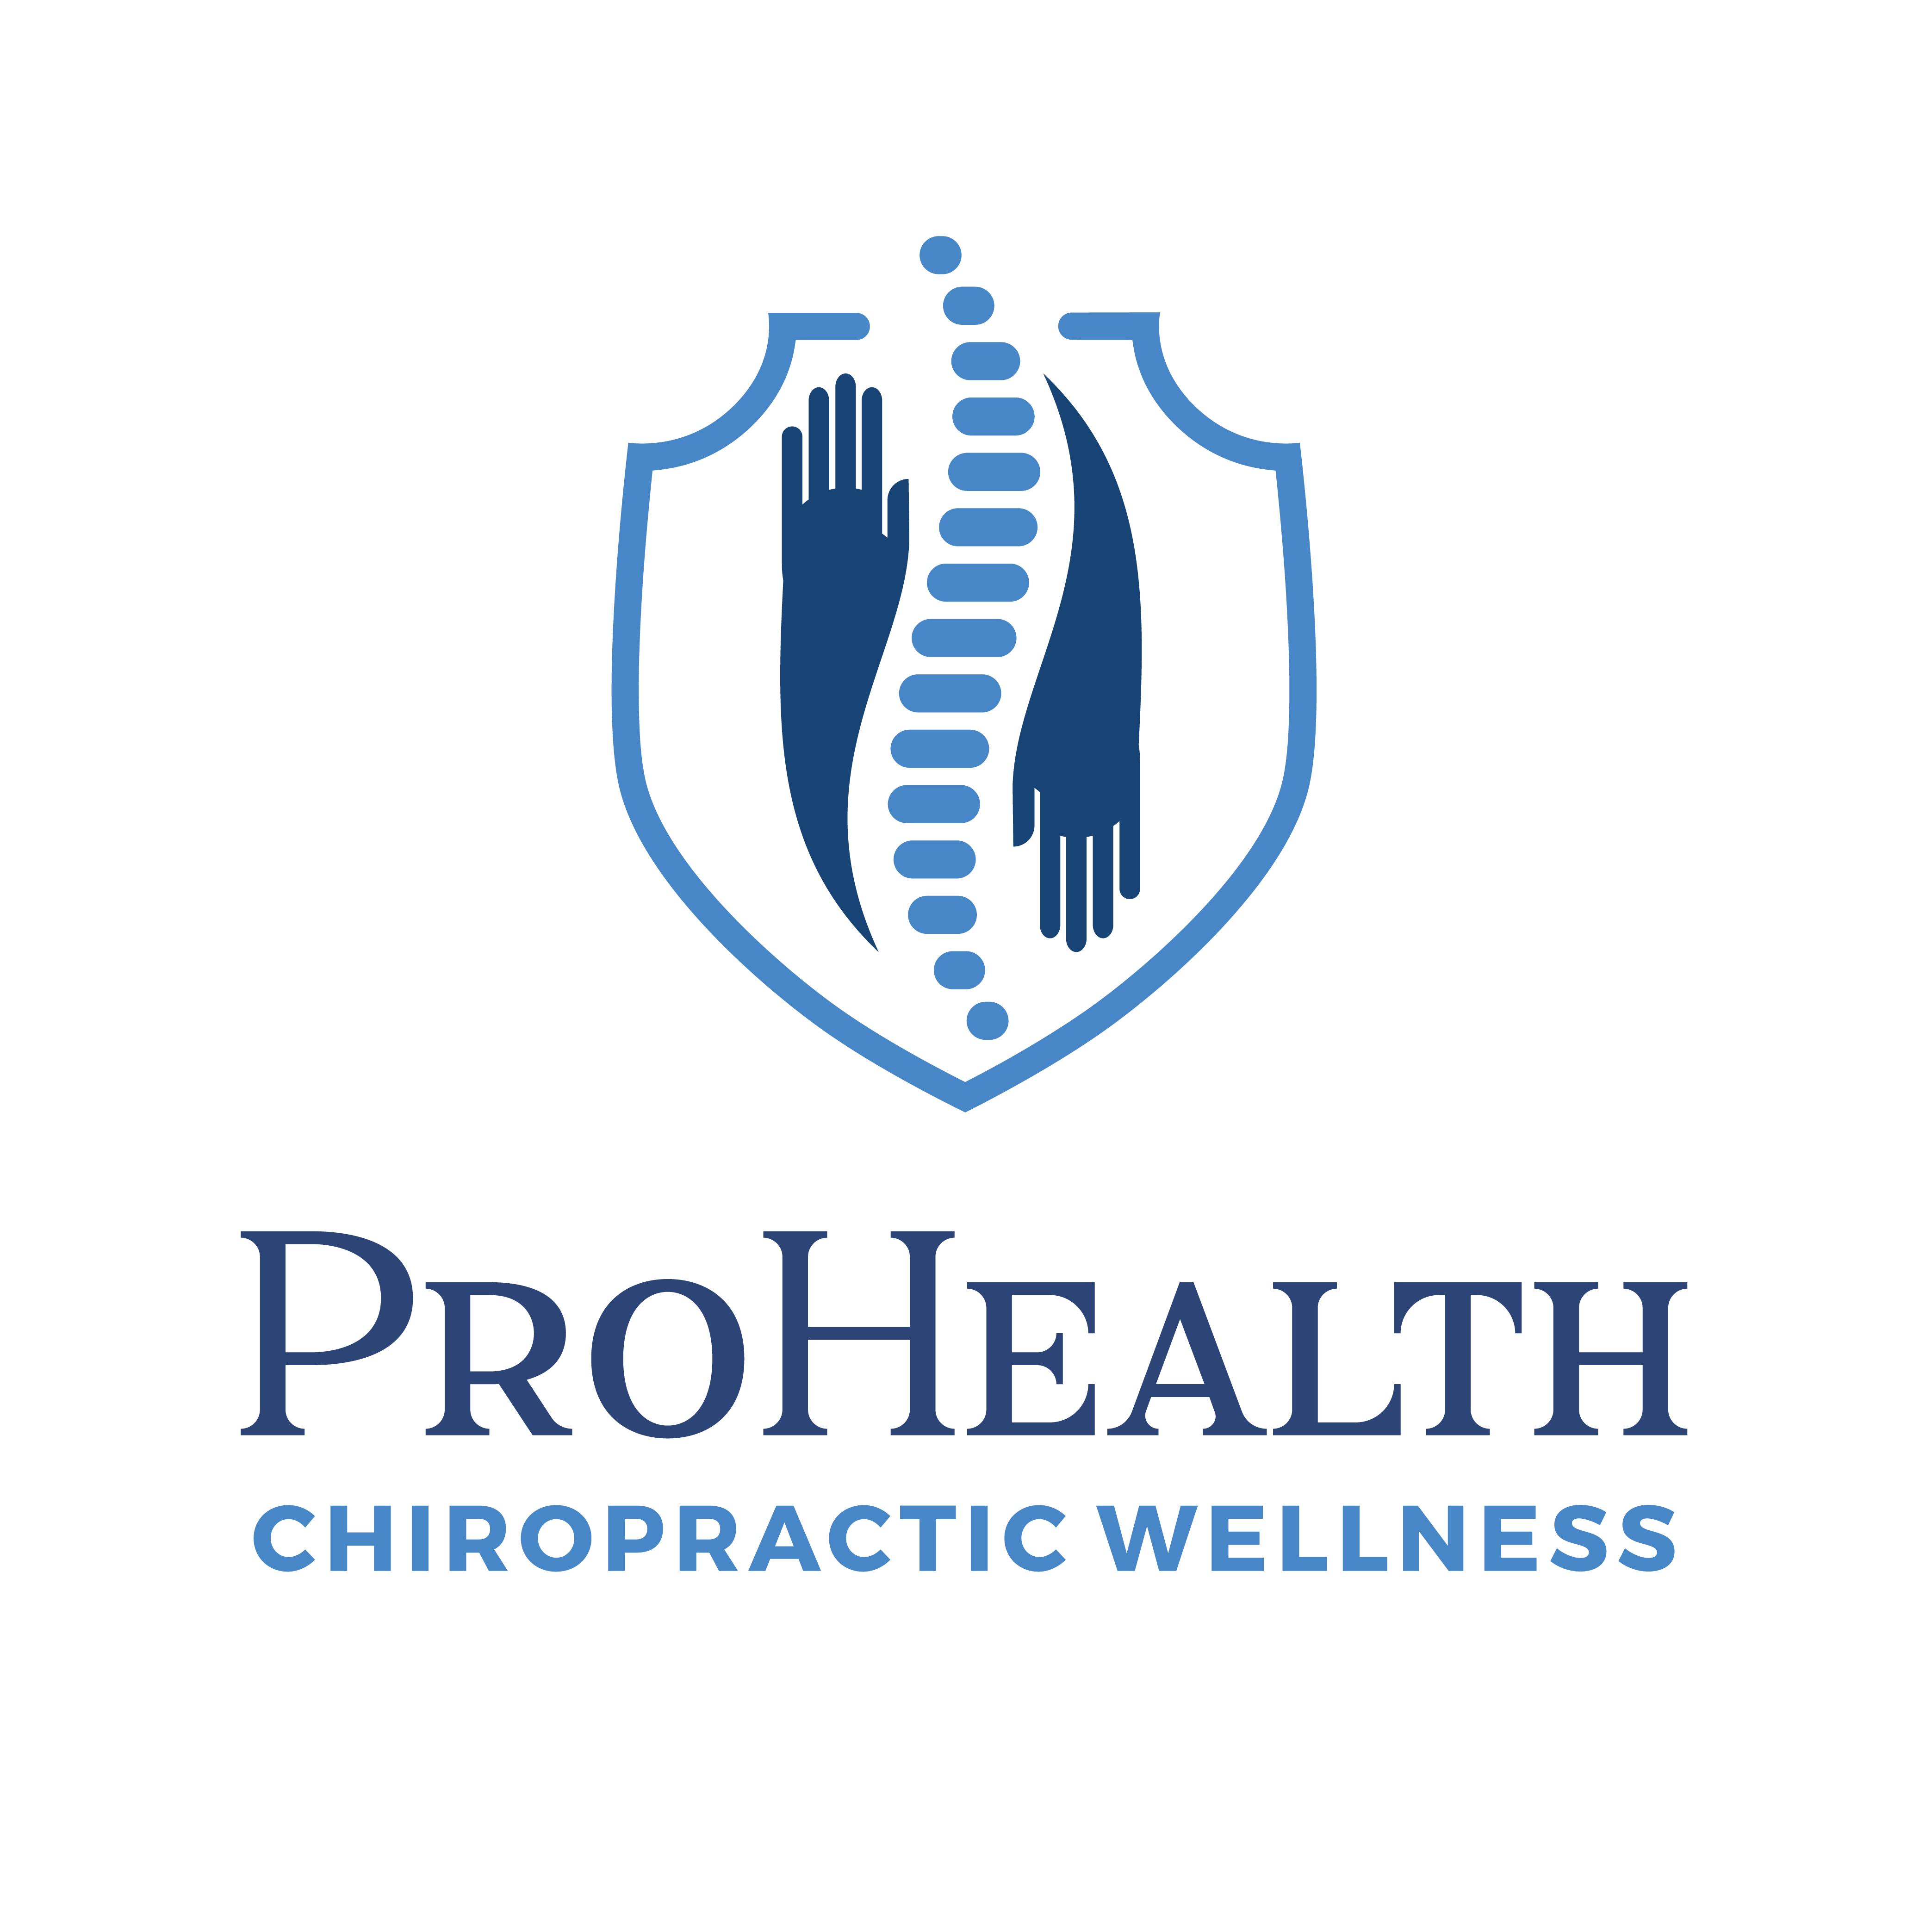 Professionally sound medical logo designer needed